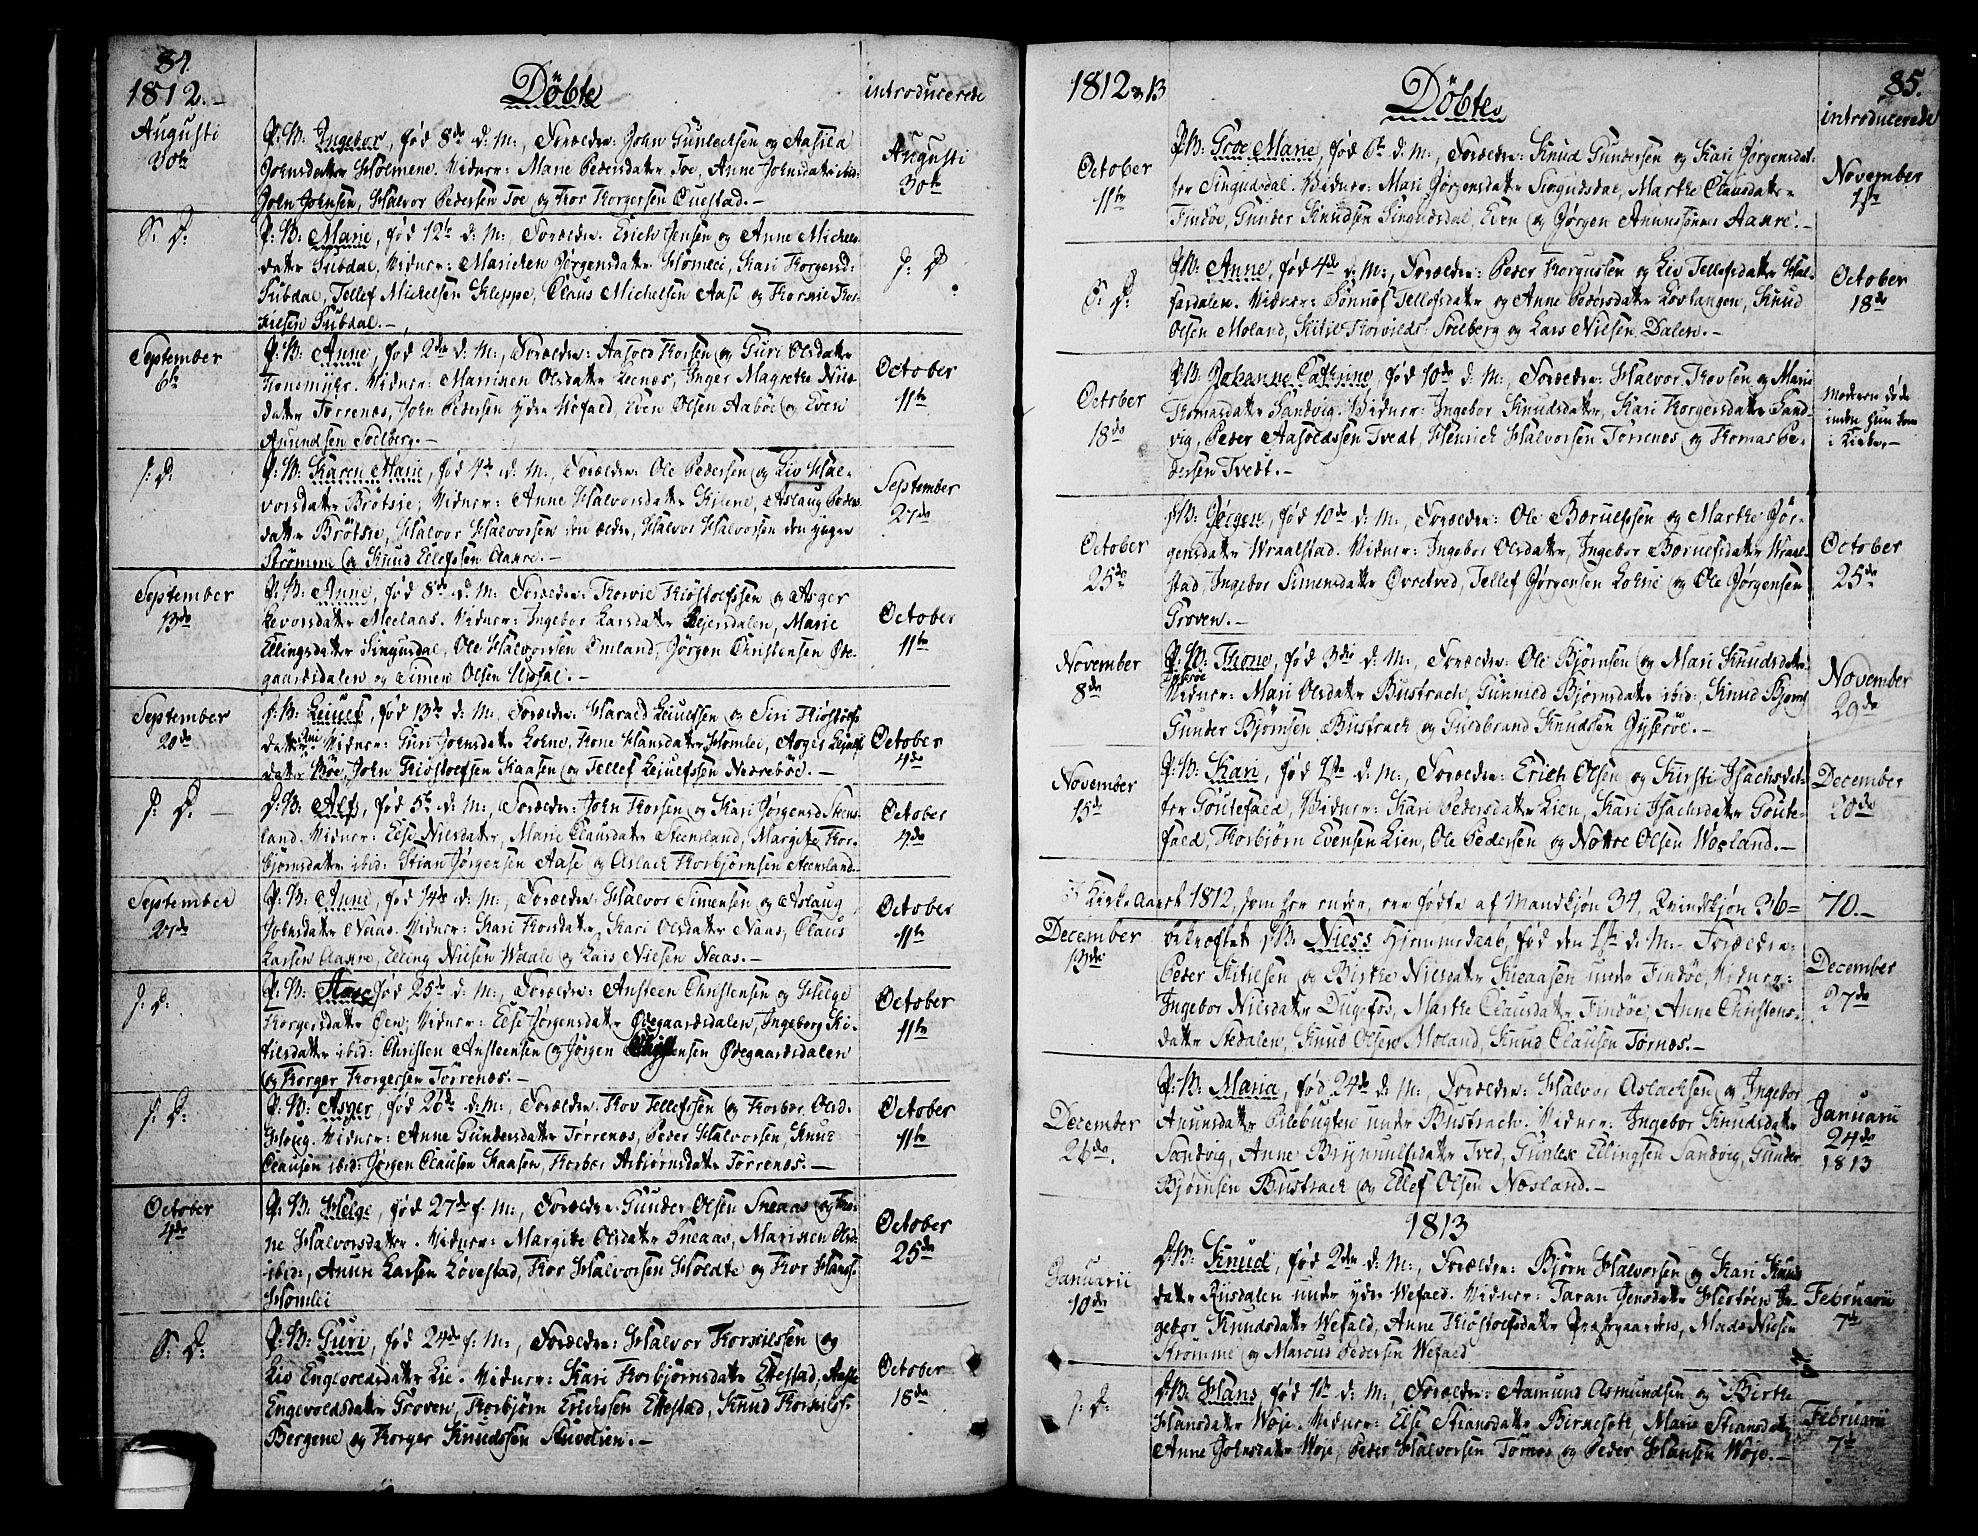 SAKO, Drangedal kirkebøker, F/Fa/L0004: Ministerialbok nr. 4, 1802-1814, s. 84-85